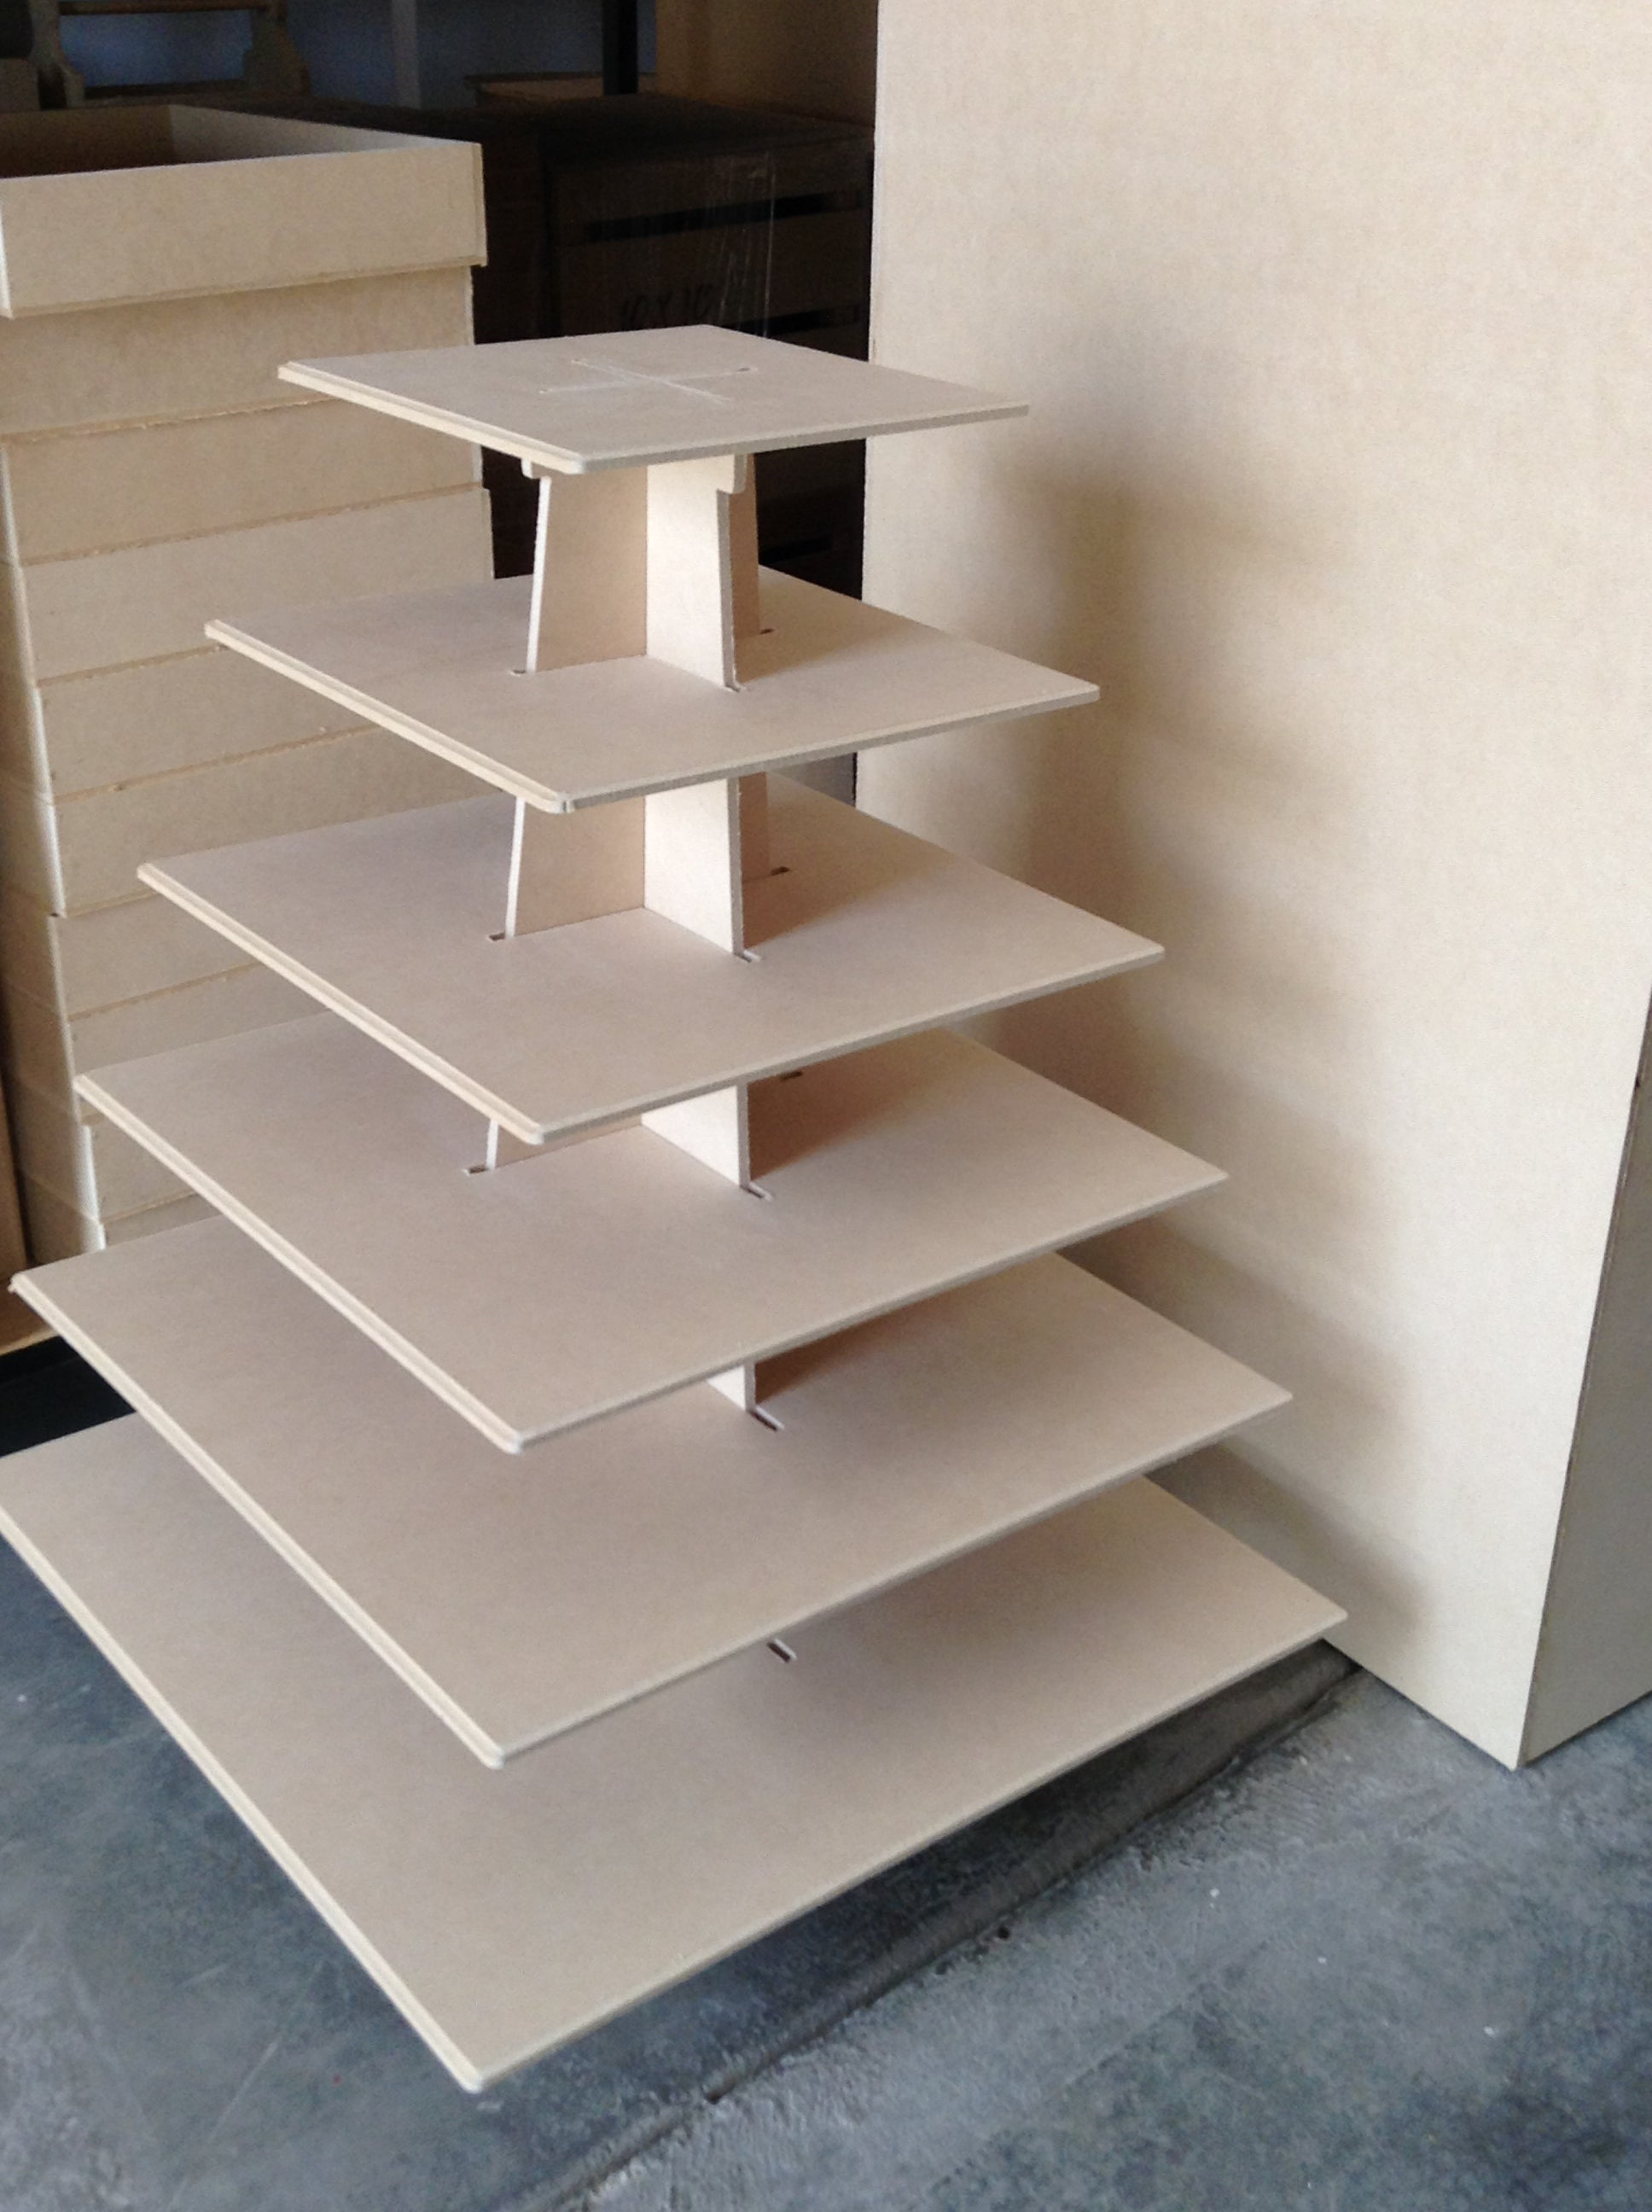 6 Tier Cupcake Stand Promacraft